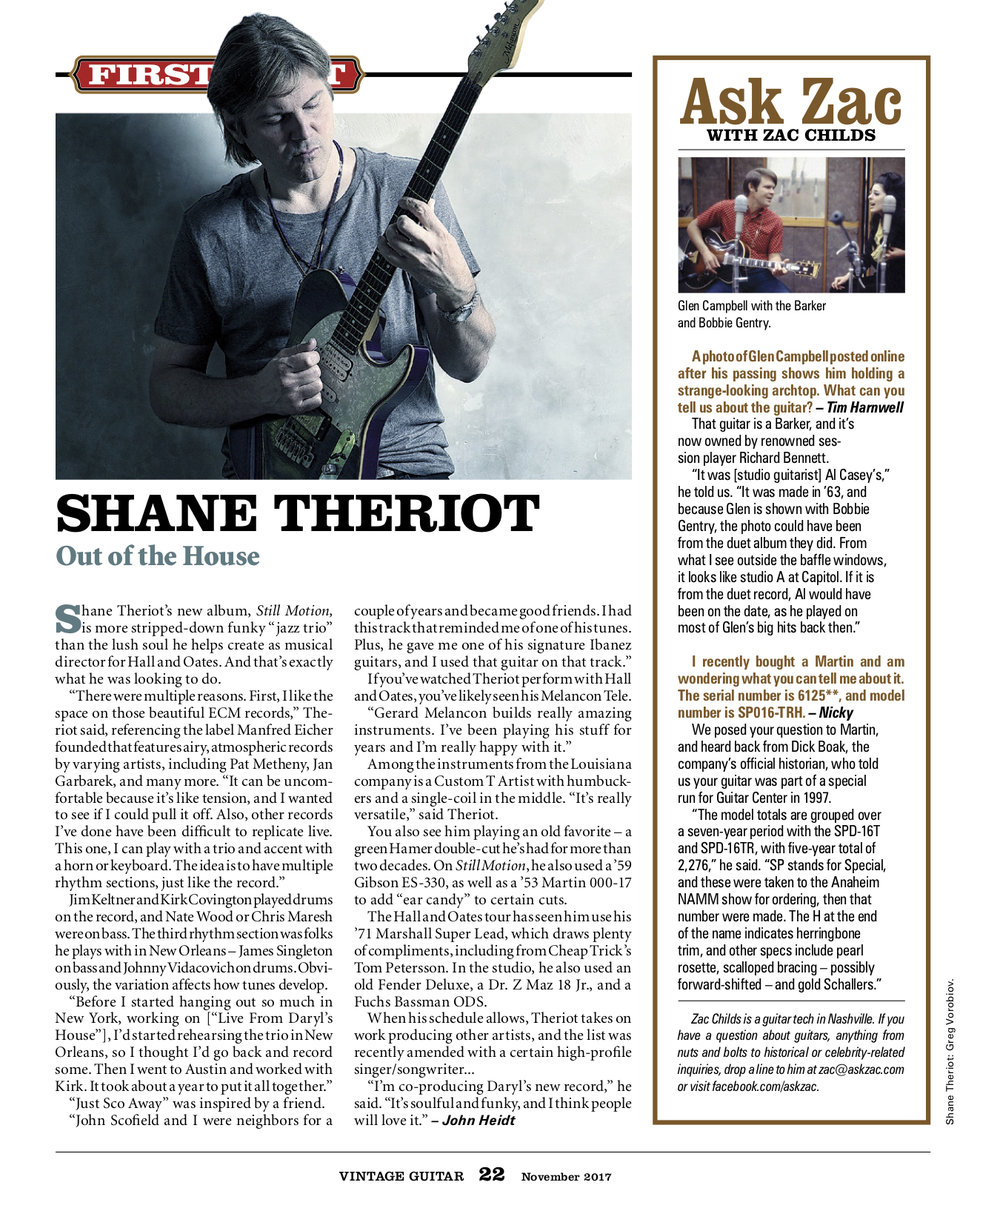 shane theriot vintage guitar magazine by greg vorobiov.jpg